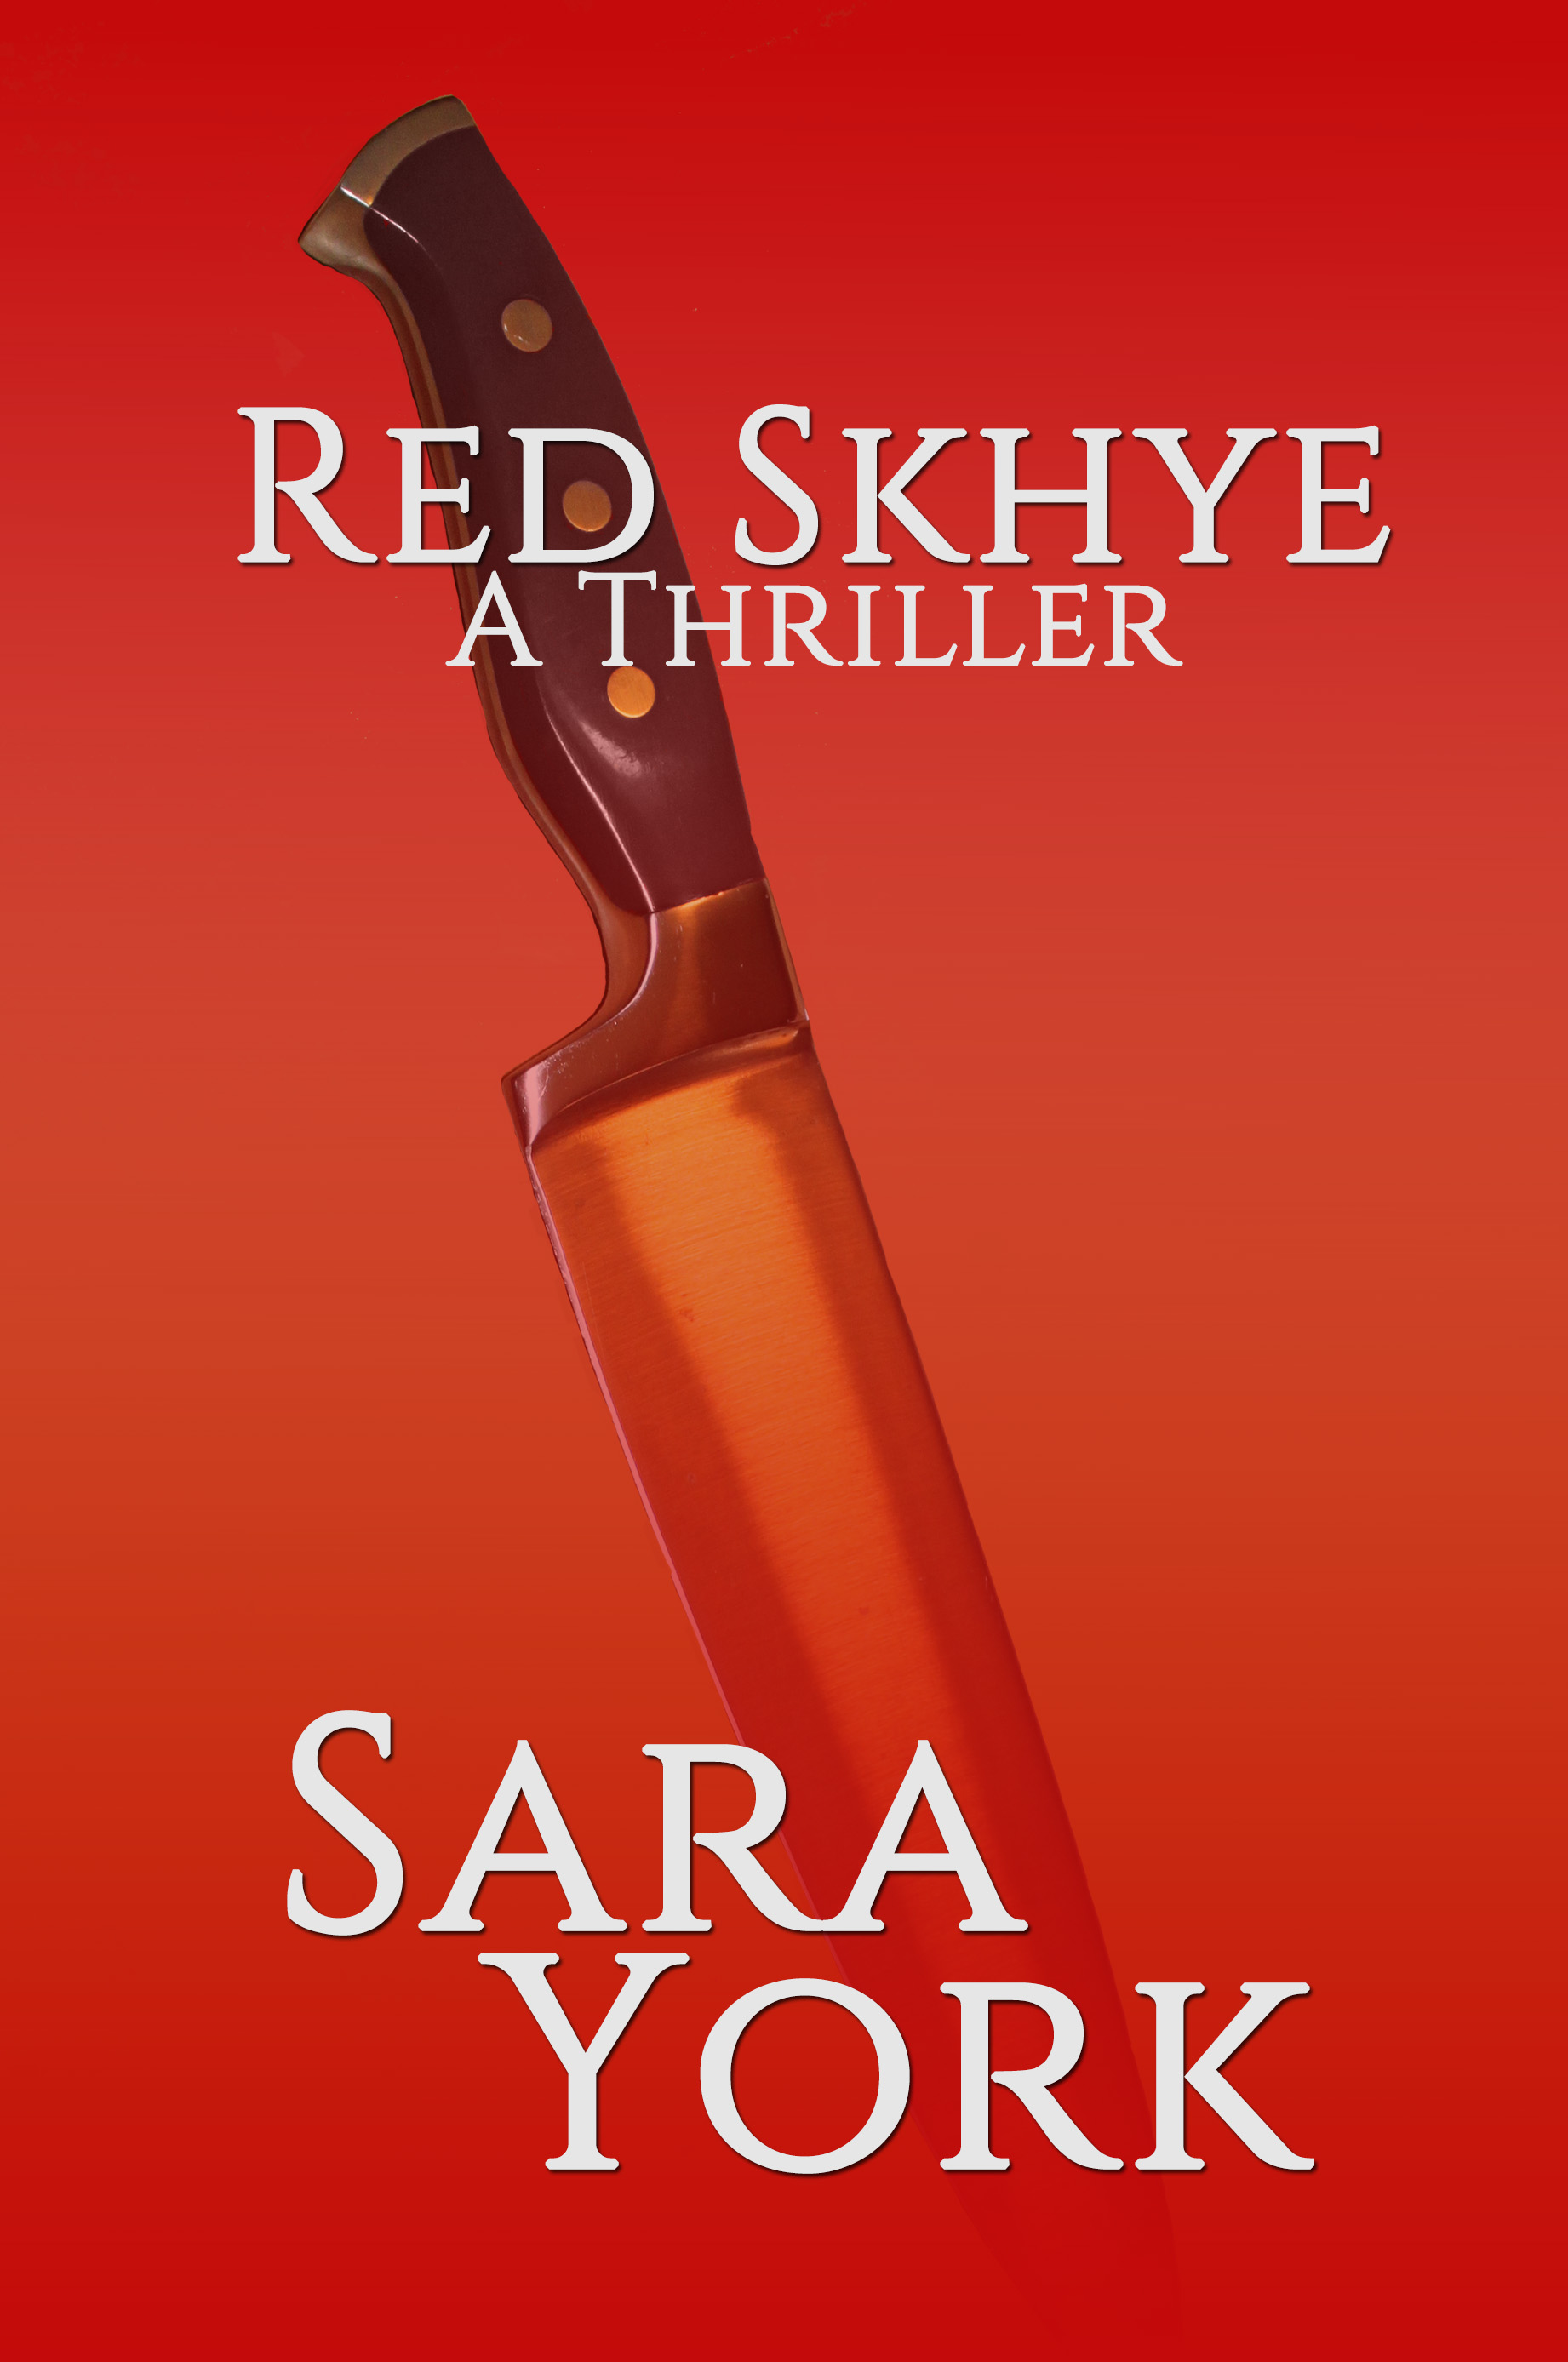 Sara York - Red Skhye